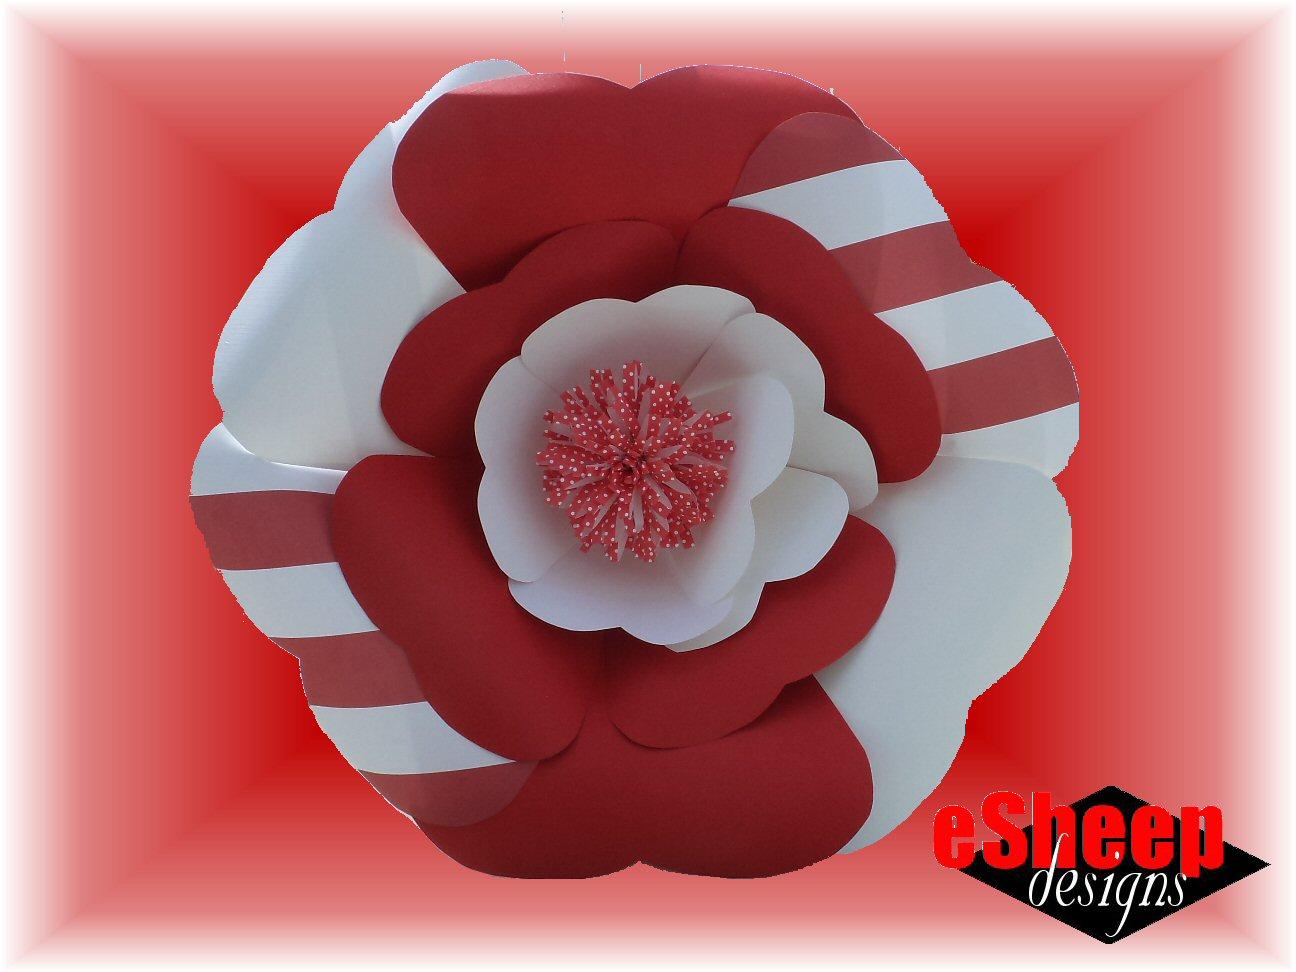 Esheep Designs Free Pdf Tutorial Designer Paper Flowers